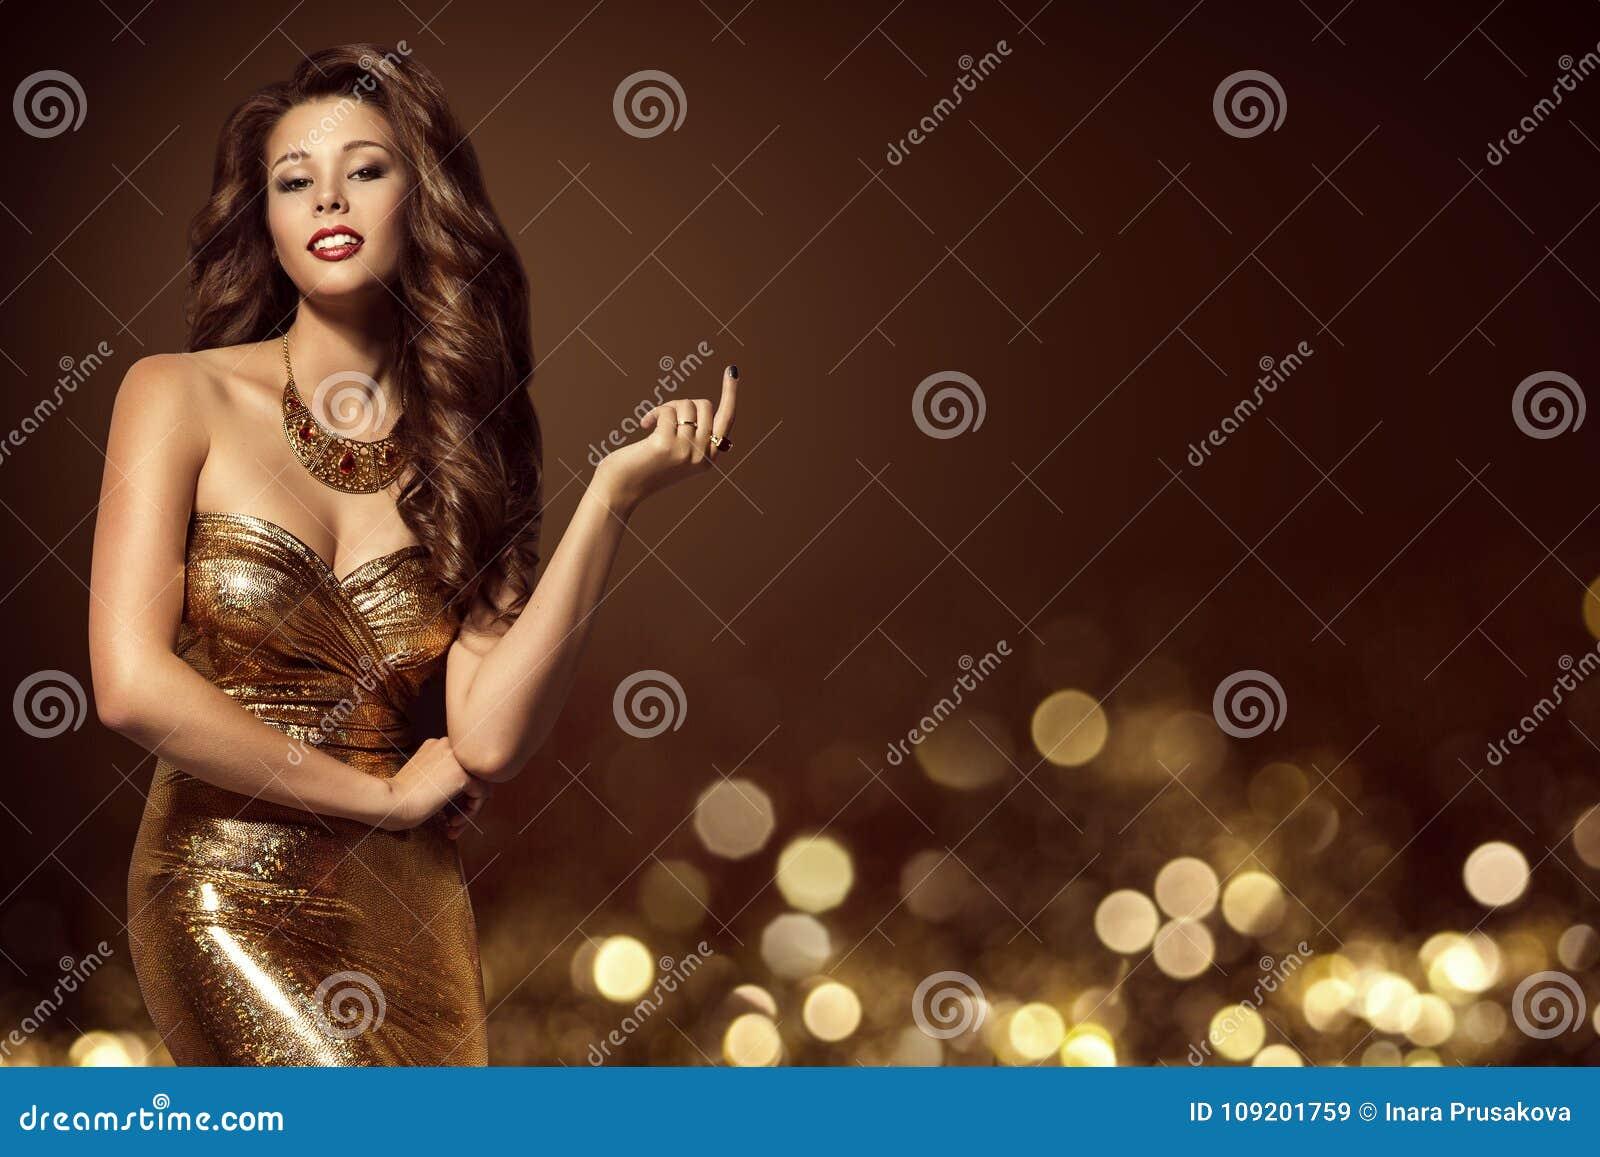 Mannequin Gold Dress, Elegante Jonge Vrouw in Gouden Toga